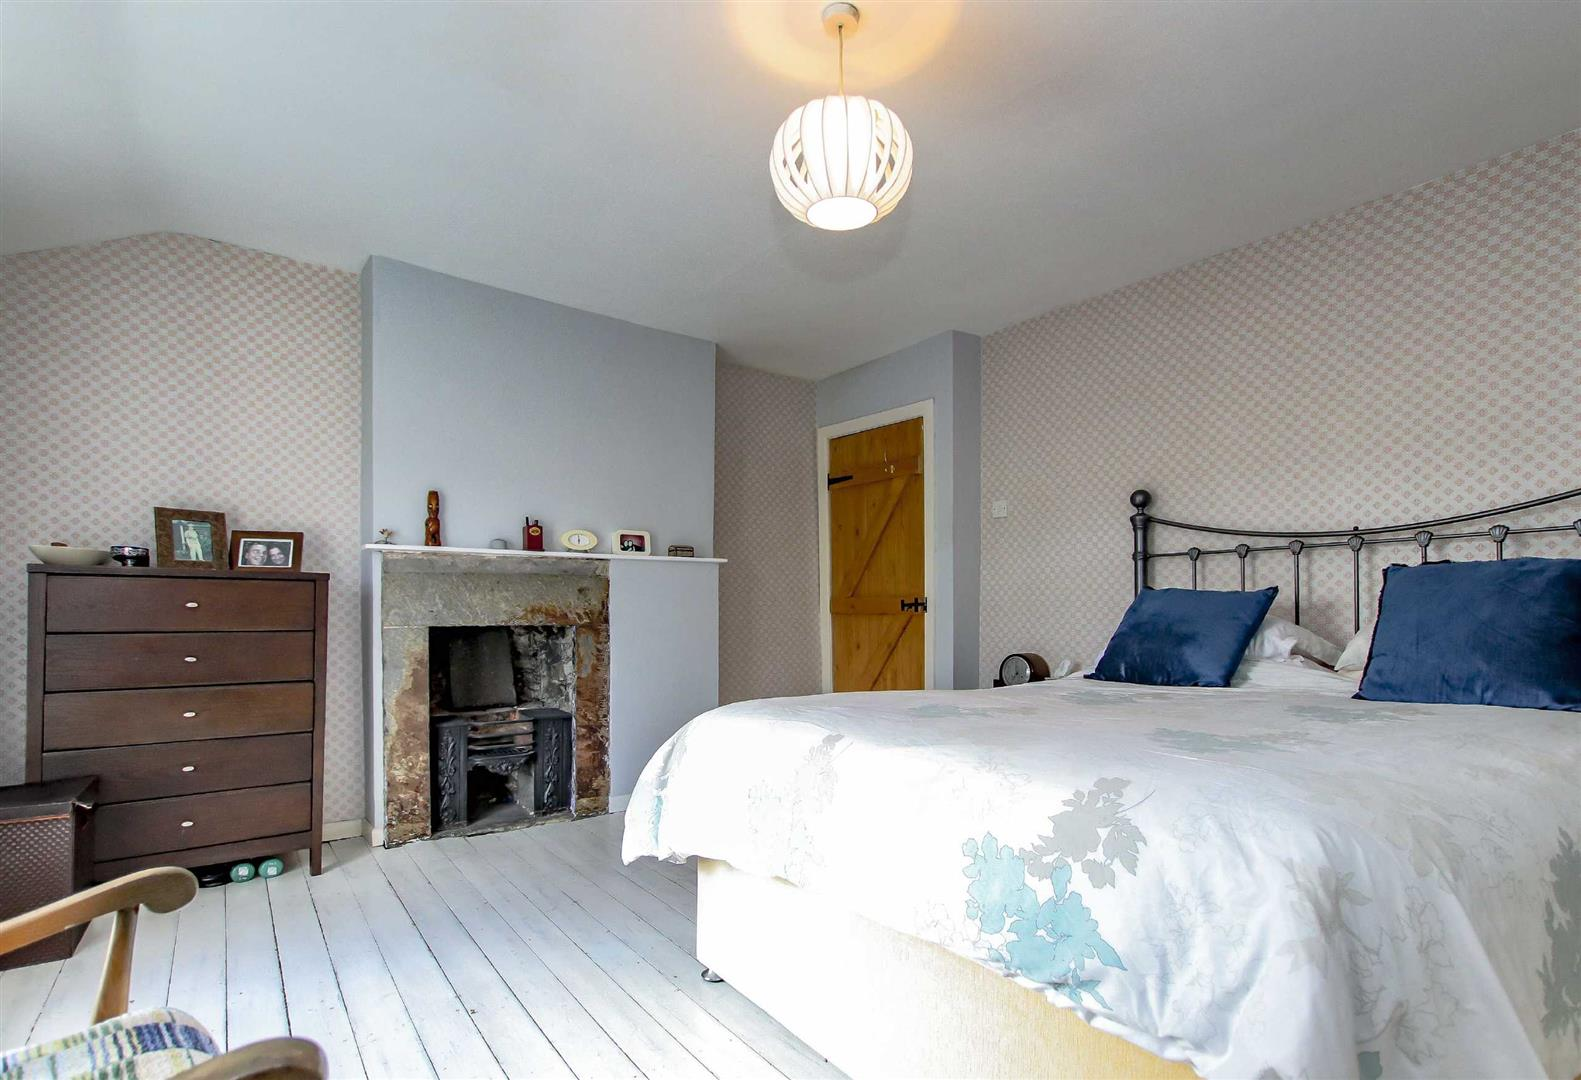 4 Bedroom Detached House For Sale - p033686_14.jpg